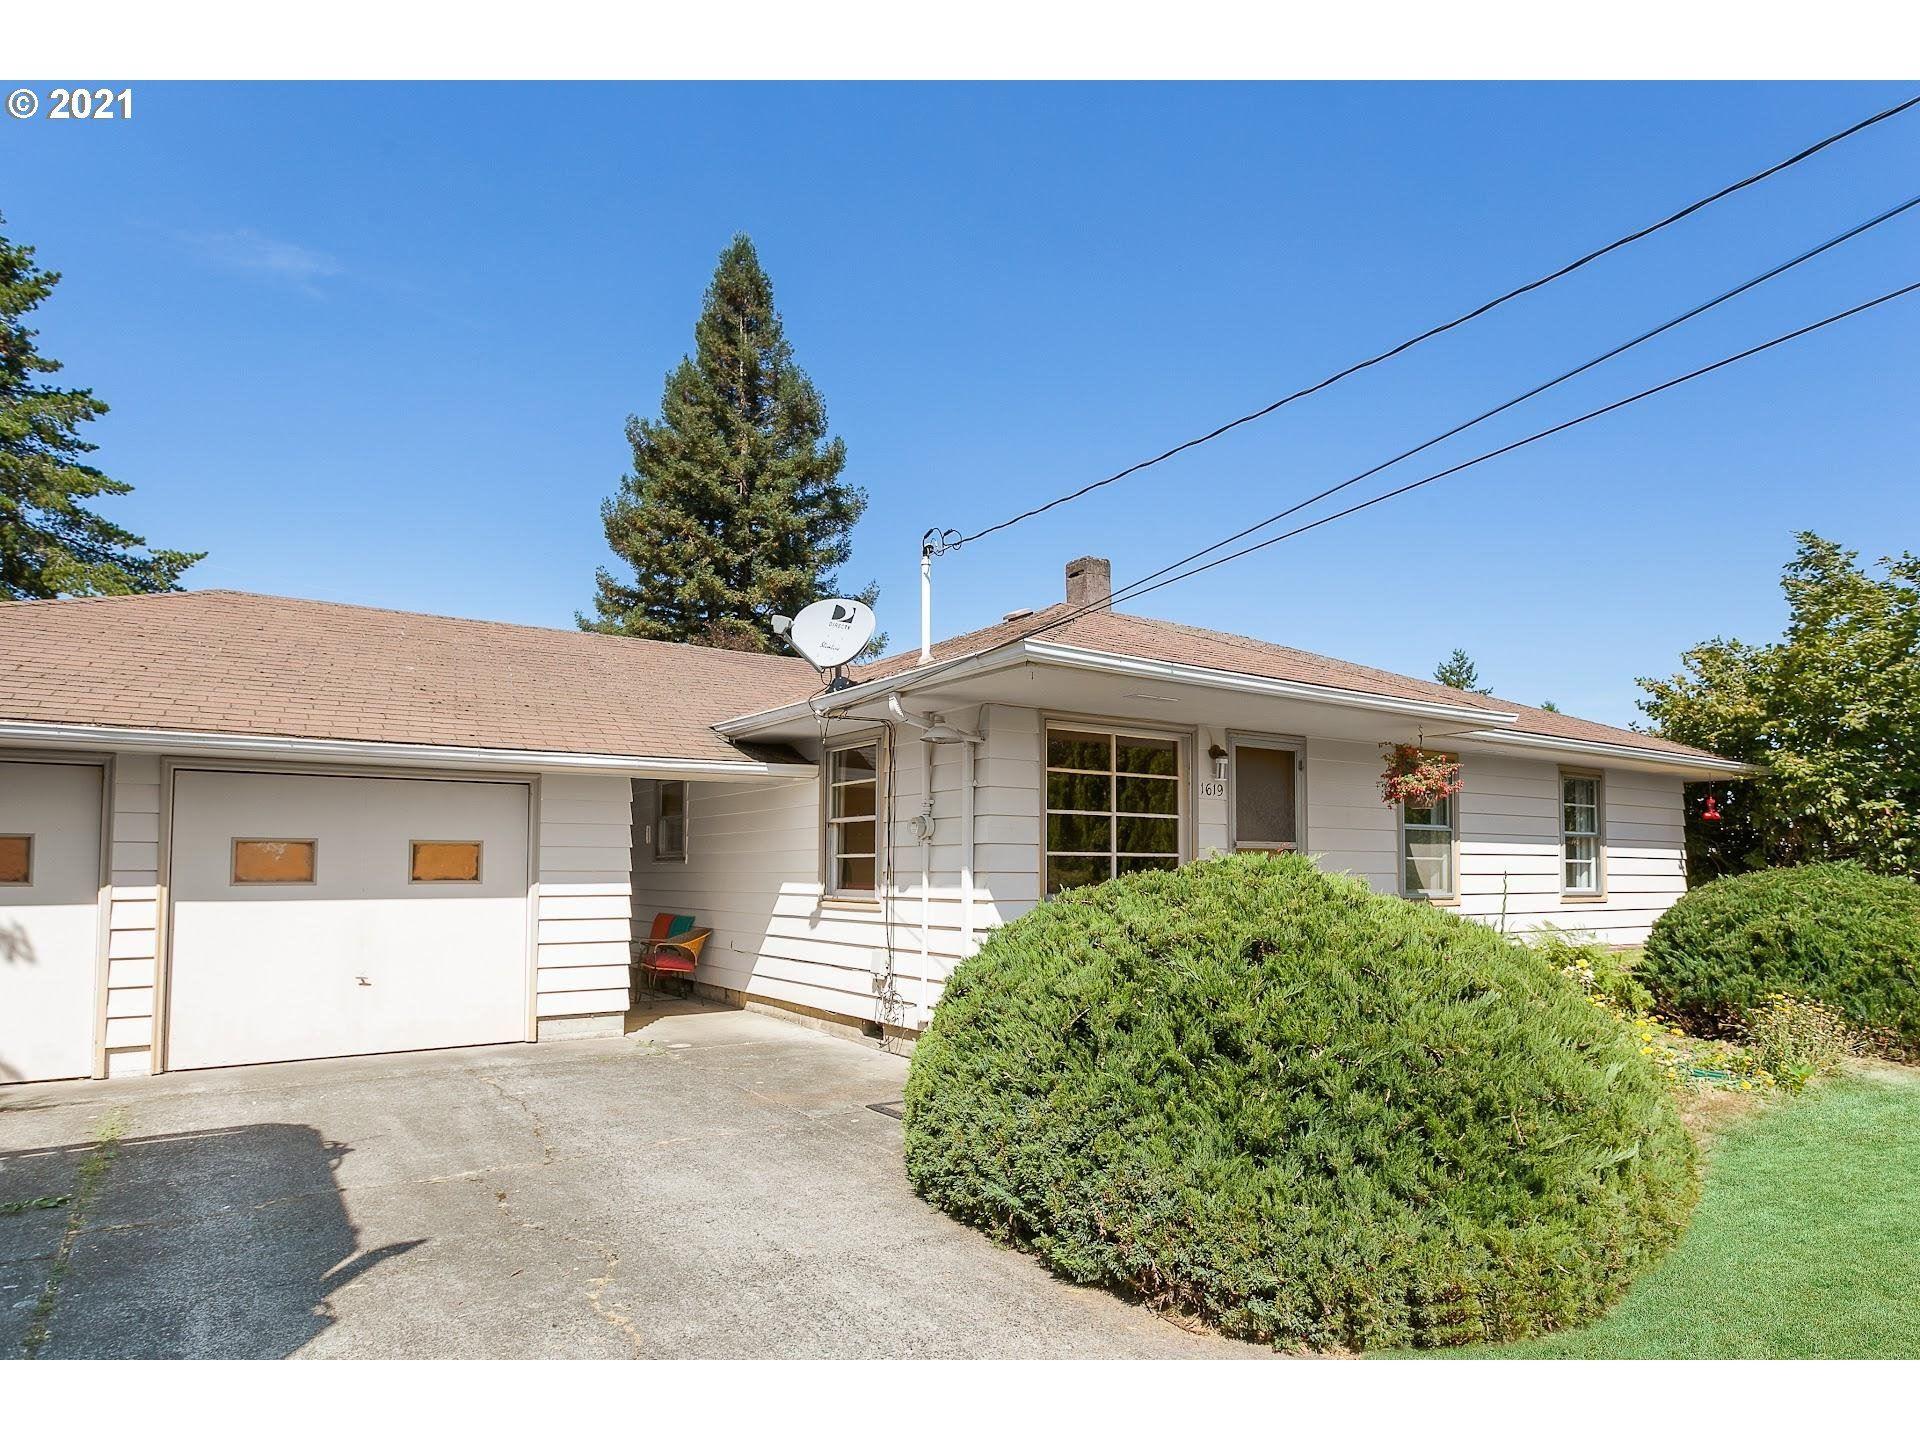 1619 NE 155TH AVE, Portland, OR 97230 - MLS#: 21595803